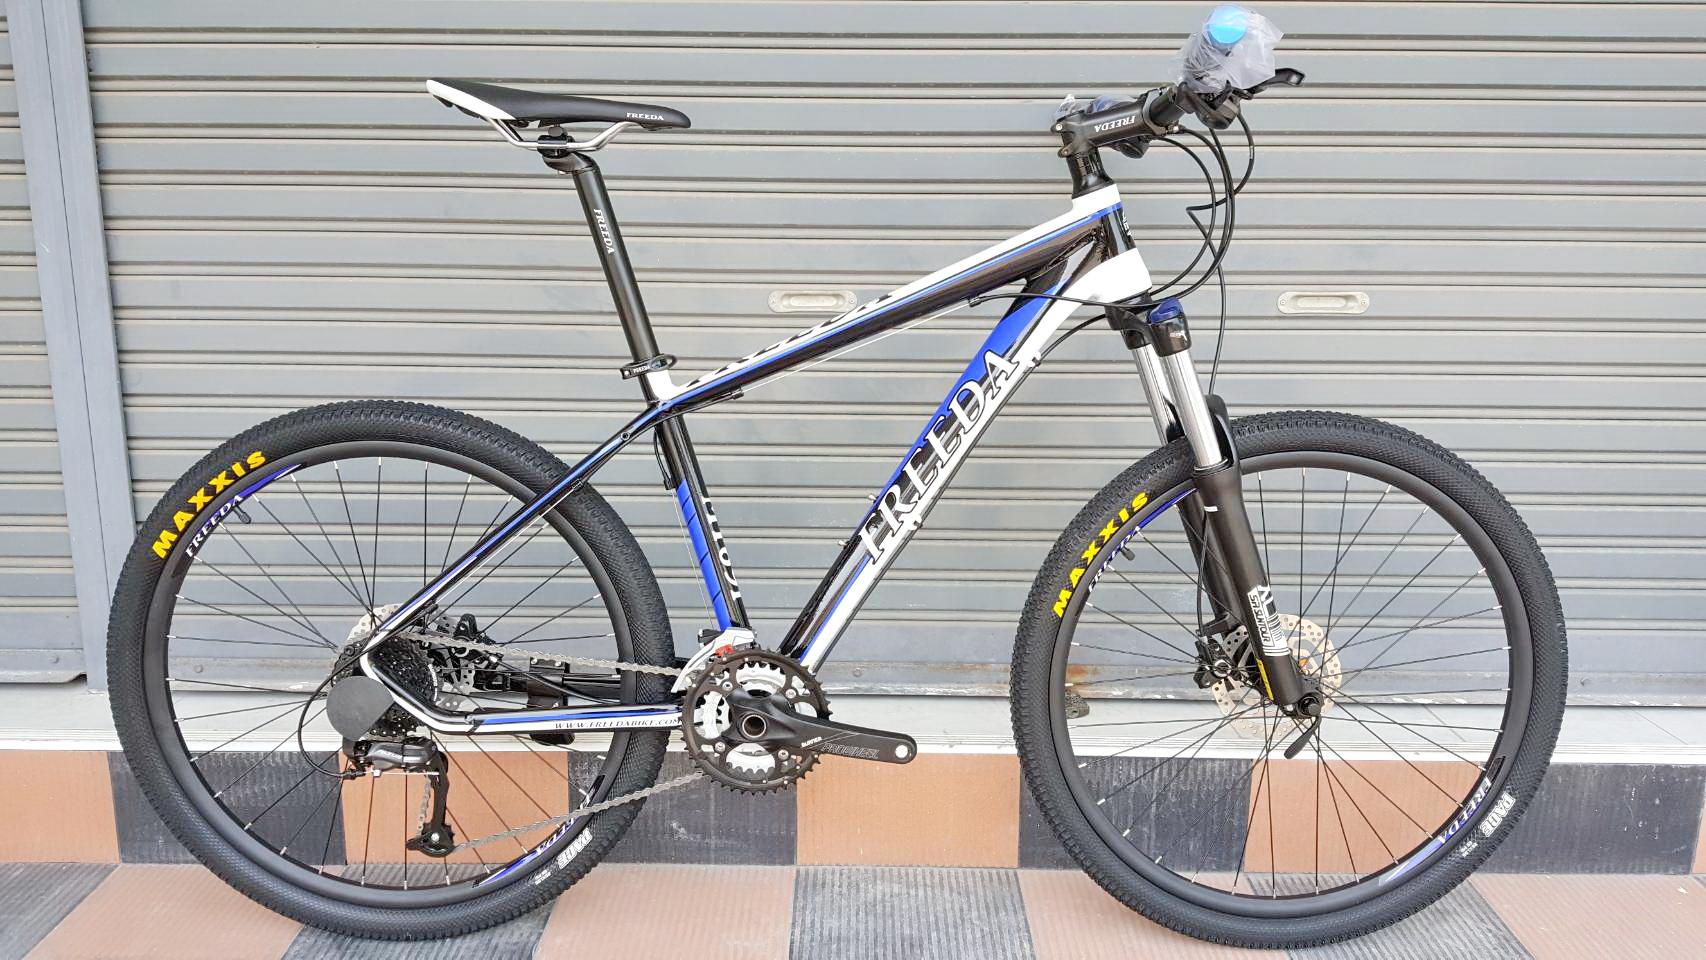 Superpromotion Freeda MT691 ล้อ 26 นิ้ว เฟรมอลู ไซส์ 17 นิ้ว ดิสก์เบรคน้ำมัน Shimano เกียร์ Shimano Altus 27 Speed กระโหลกกลวง โช๊คล็อค